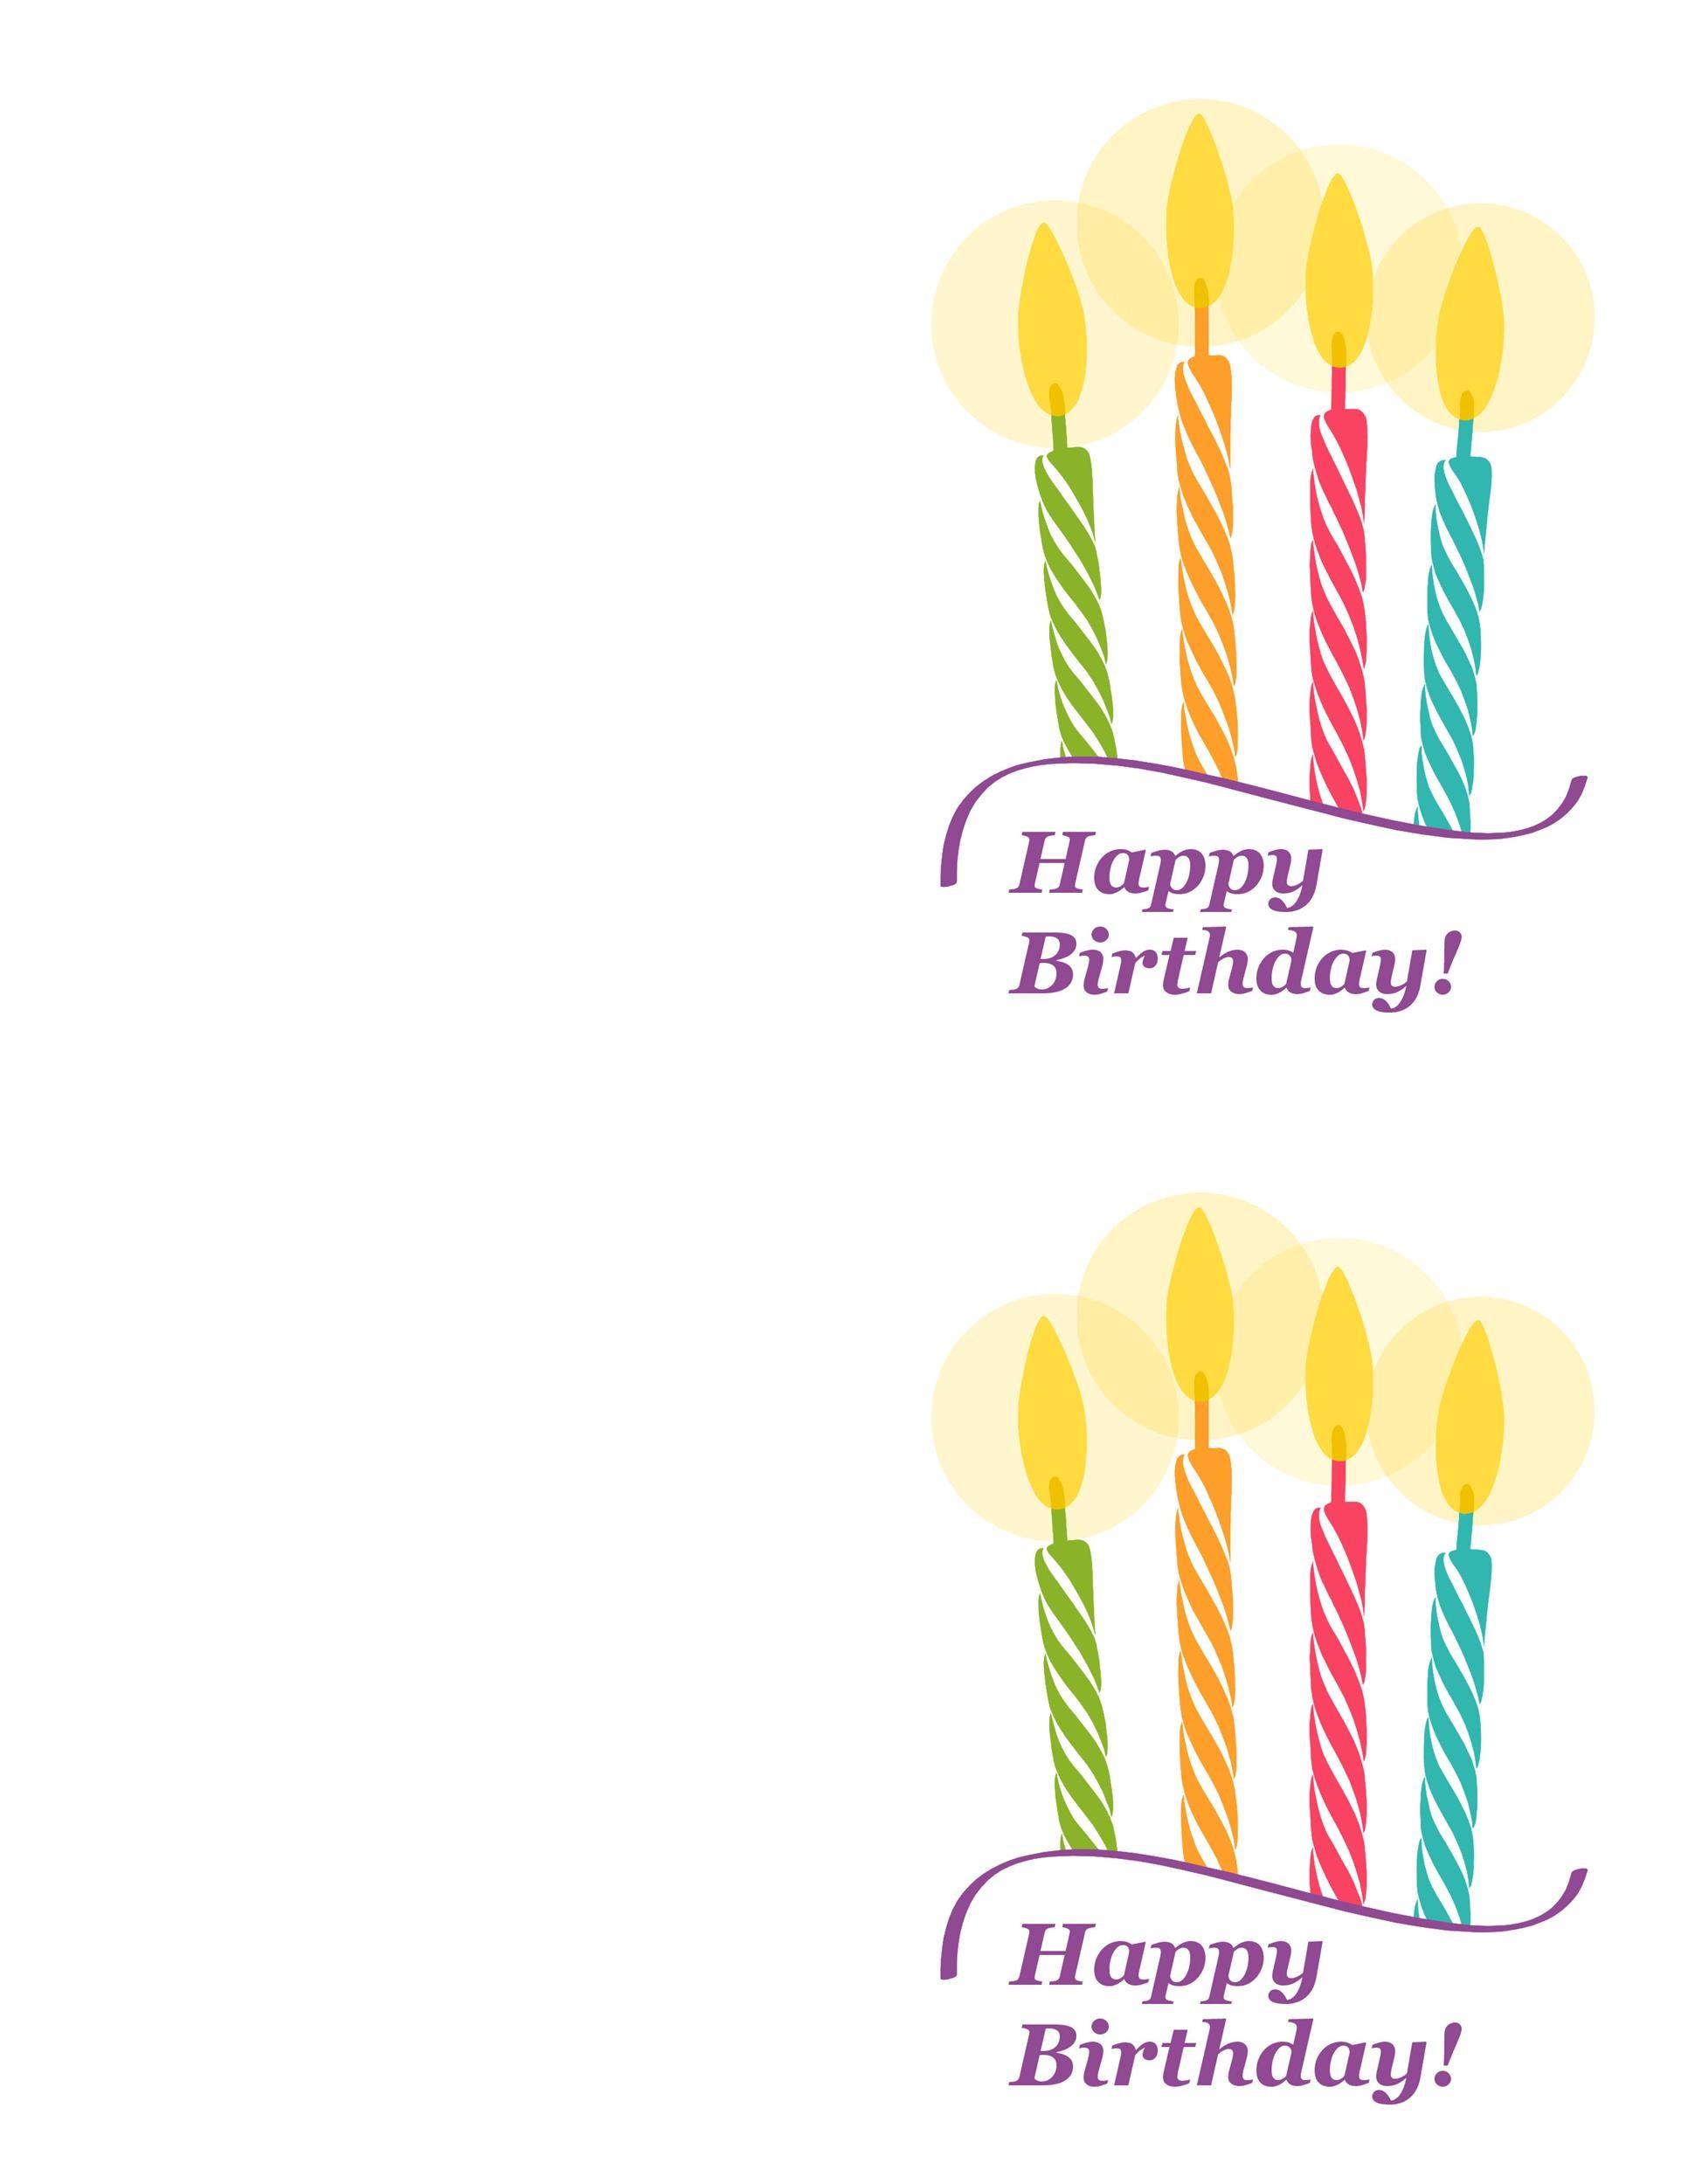 Free birthday card template 21